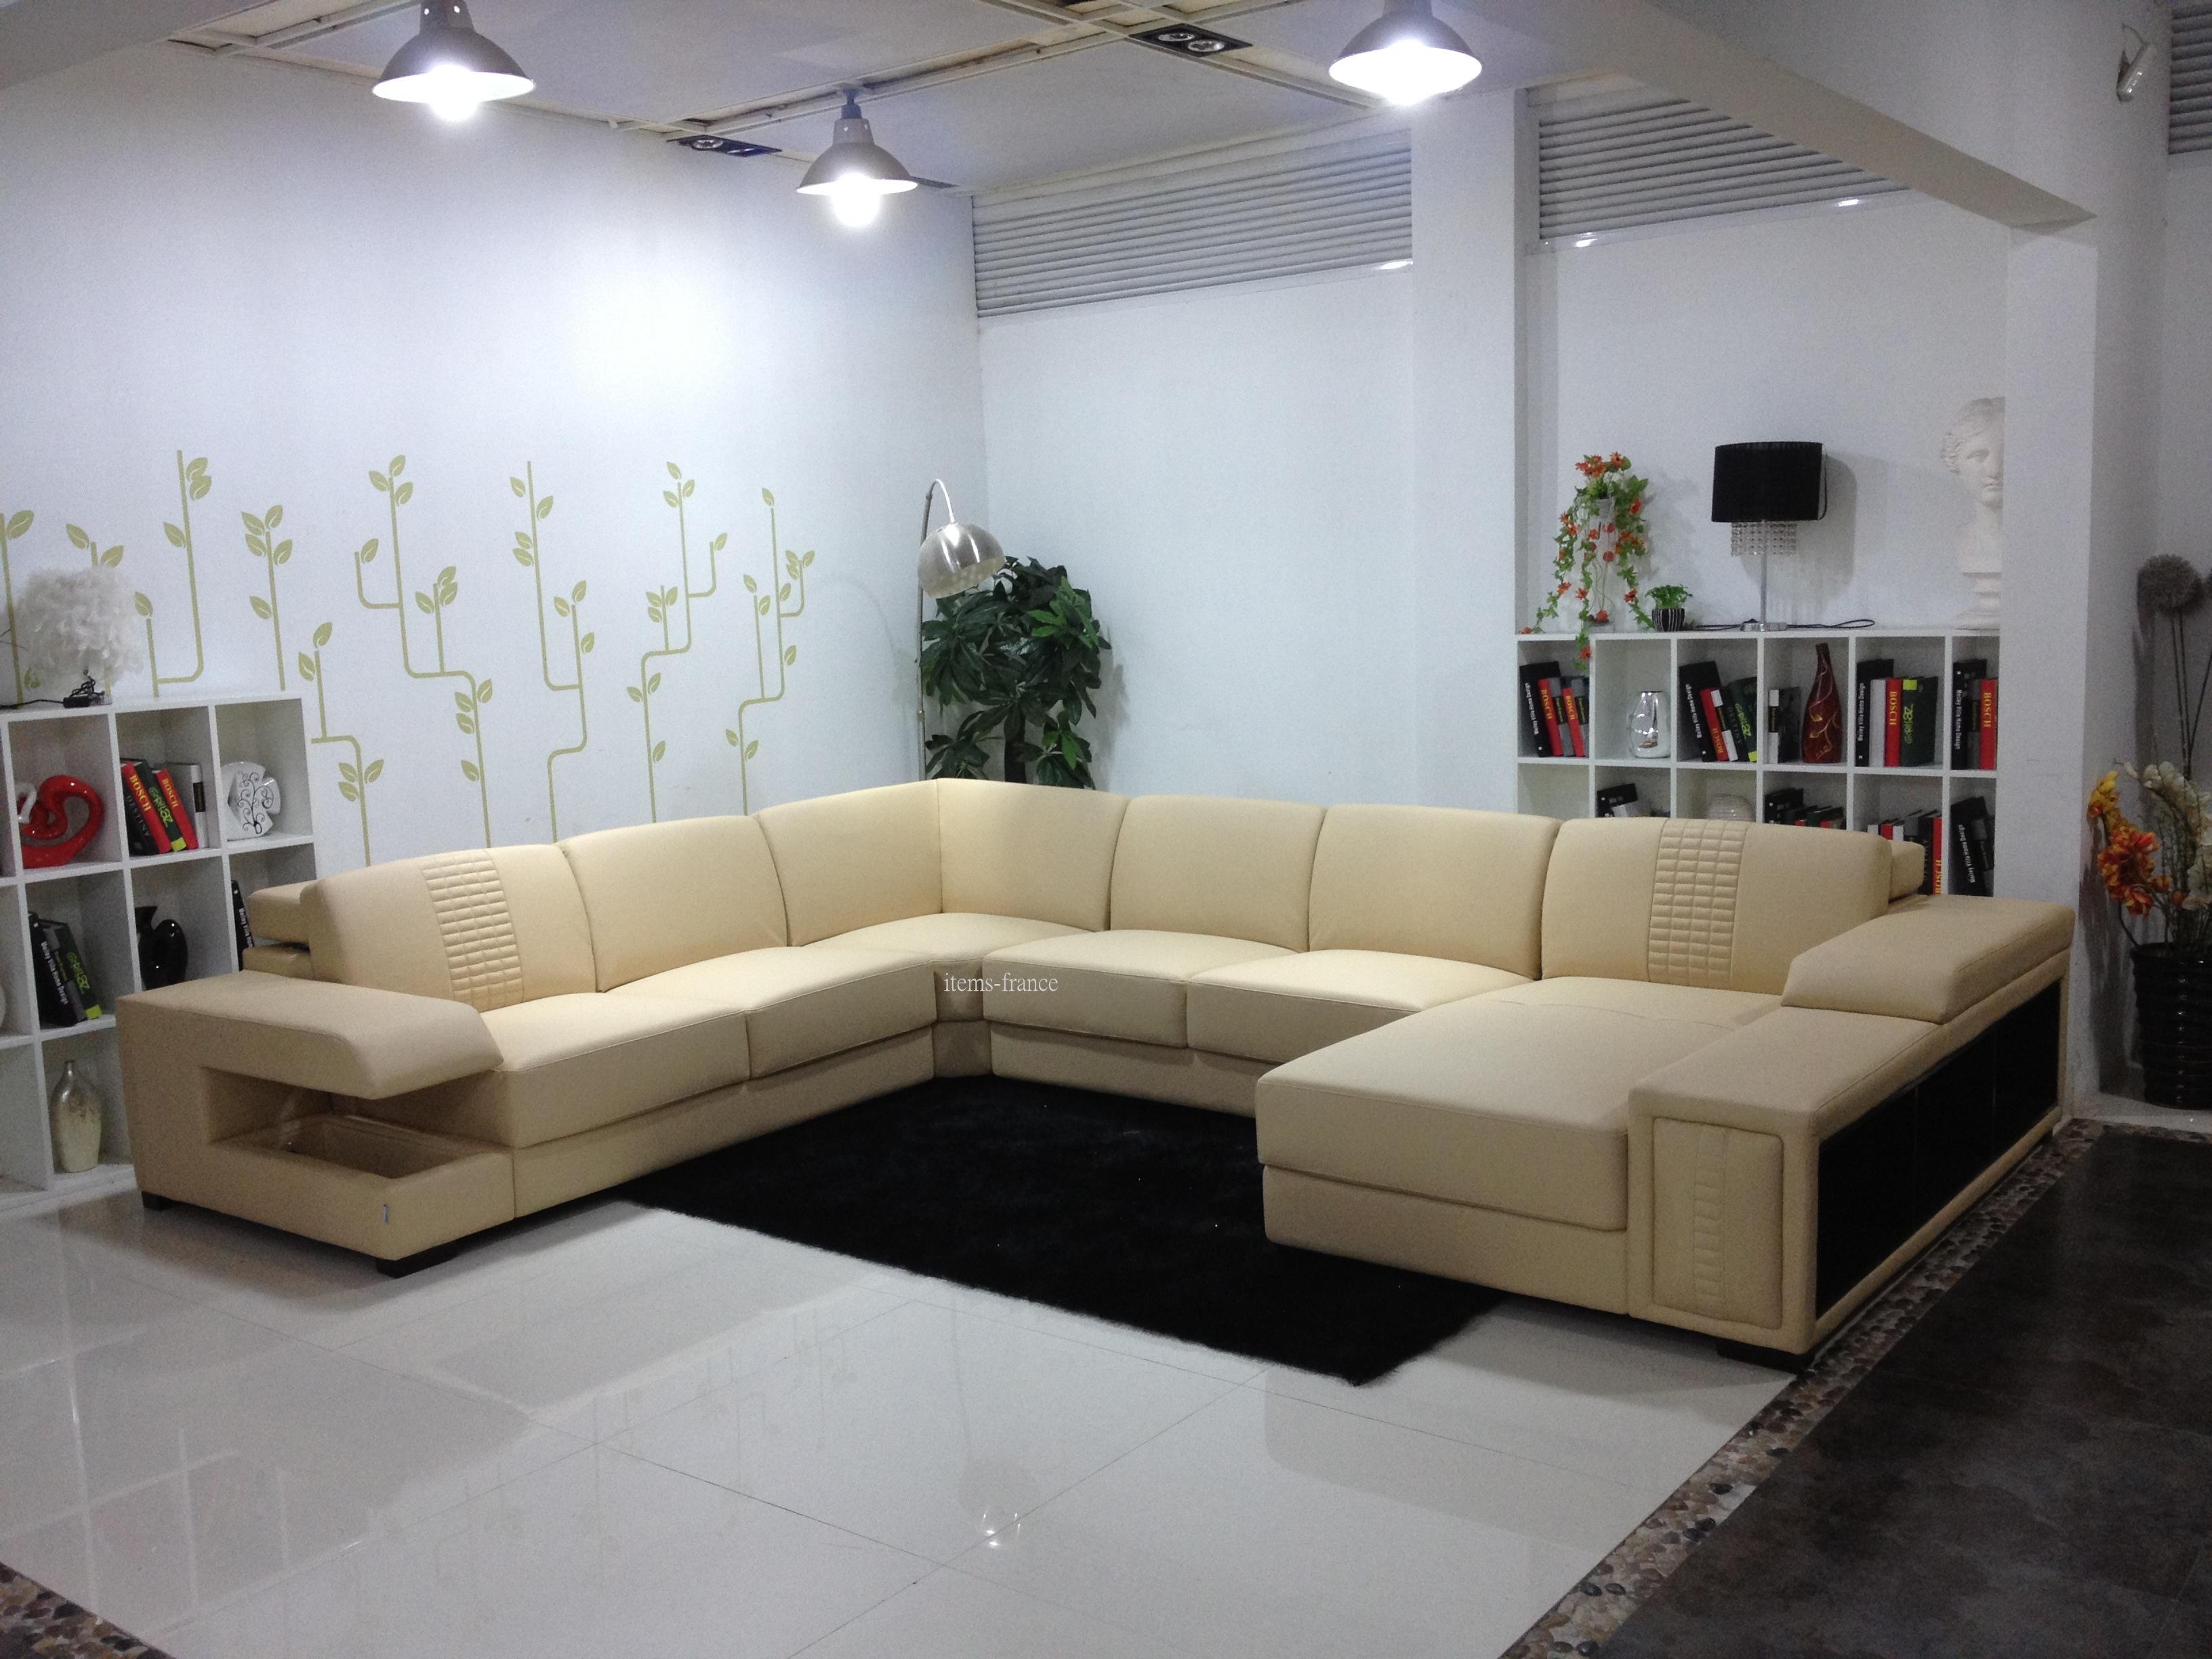 canap panoramique cuir nemosa canap cuir 6 places. Black Bedroom Furniture Sets. Home Design Ideas